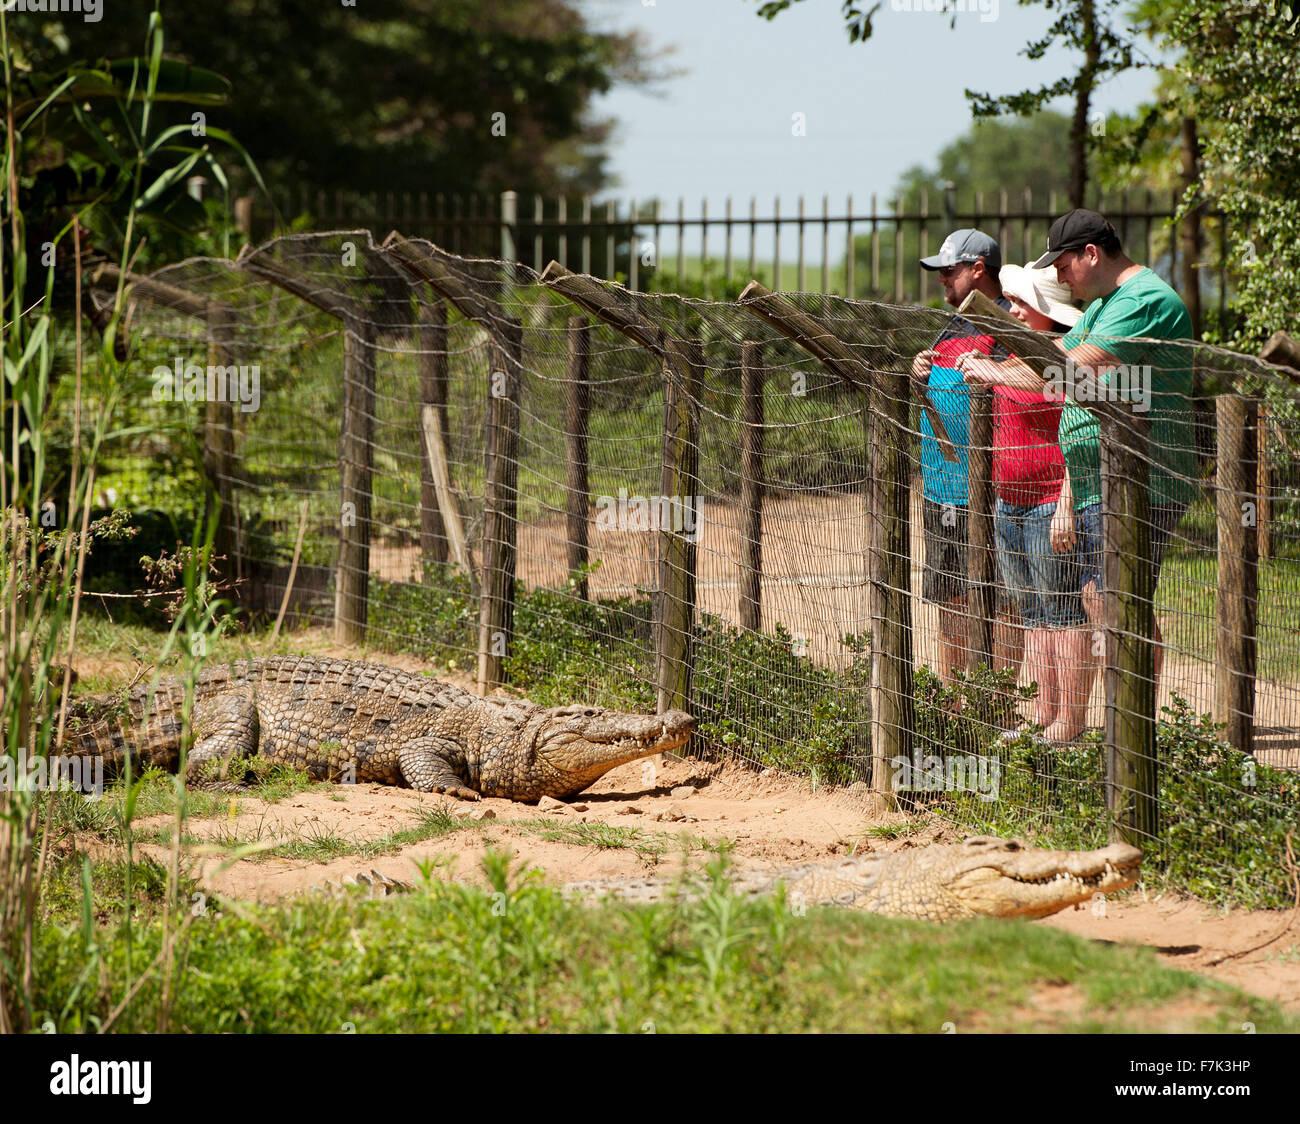 Nile crocodiles at the Crocworld crocodile farm  at Scottburgh, on the South Coast of KwaZulu Natal, South Africa. - Stock Image